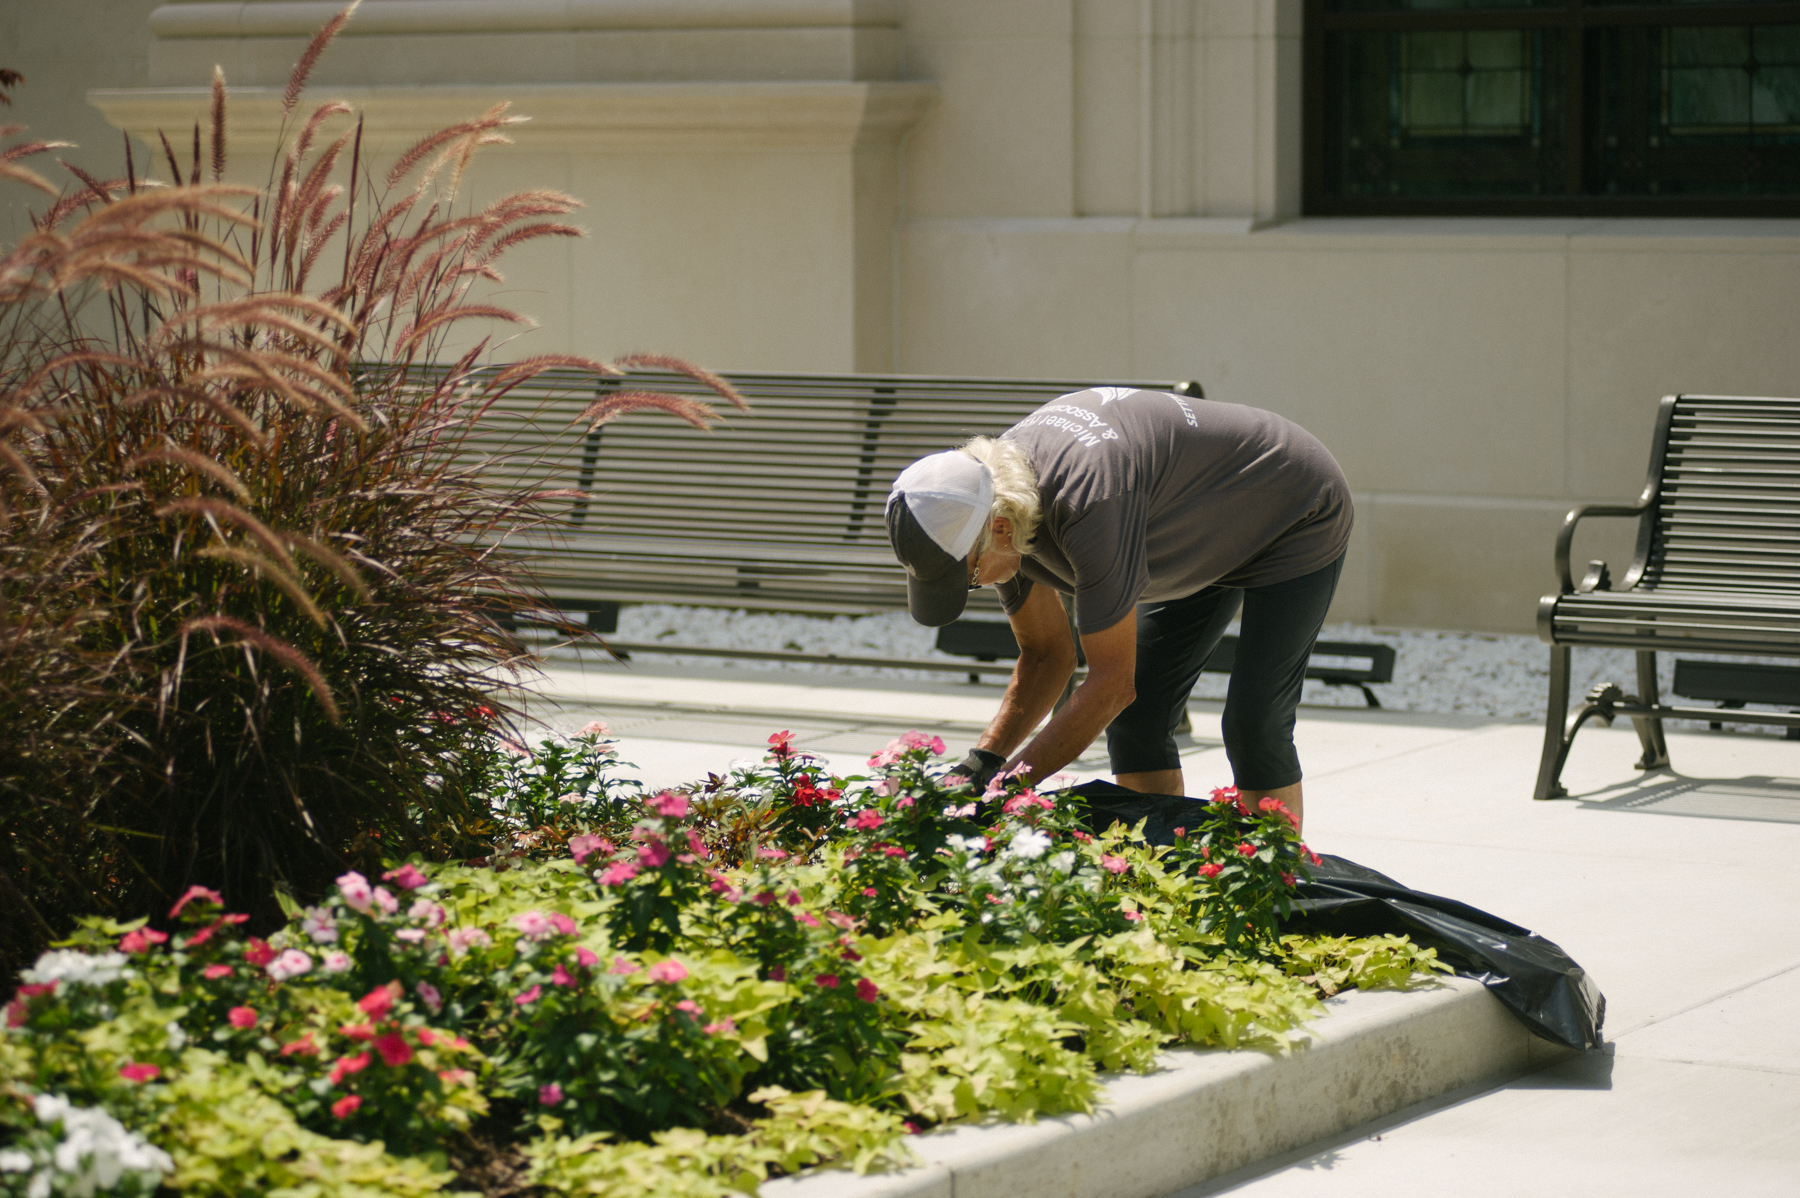 Commercial landscaping enhancements